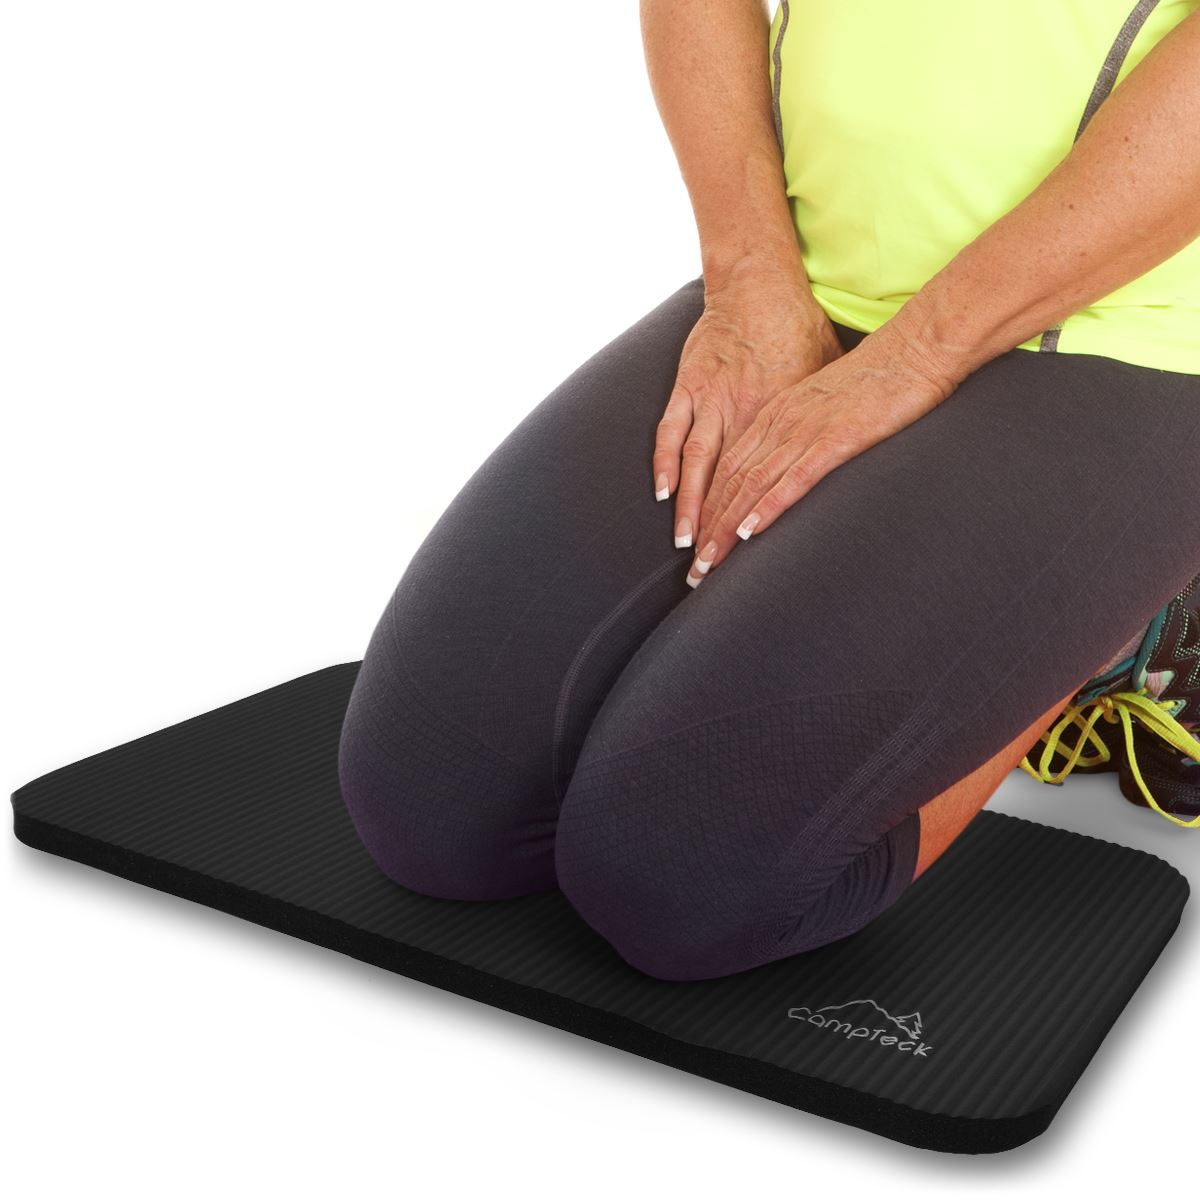 Yoga Knee Pad Cushion Soft Foam Yoga Knee Mat Support Gym Fitness Exercise